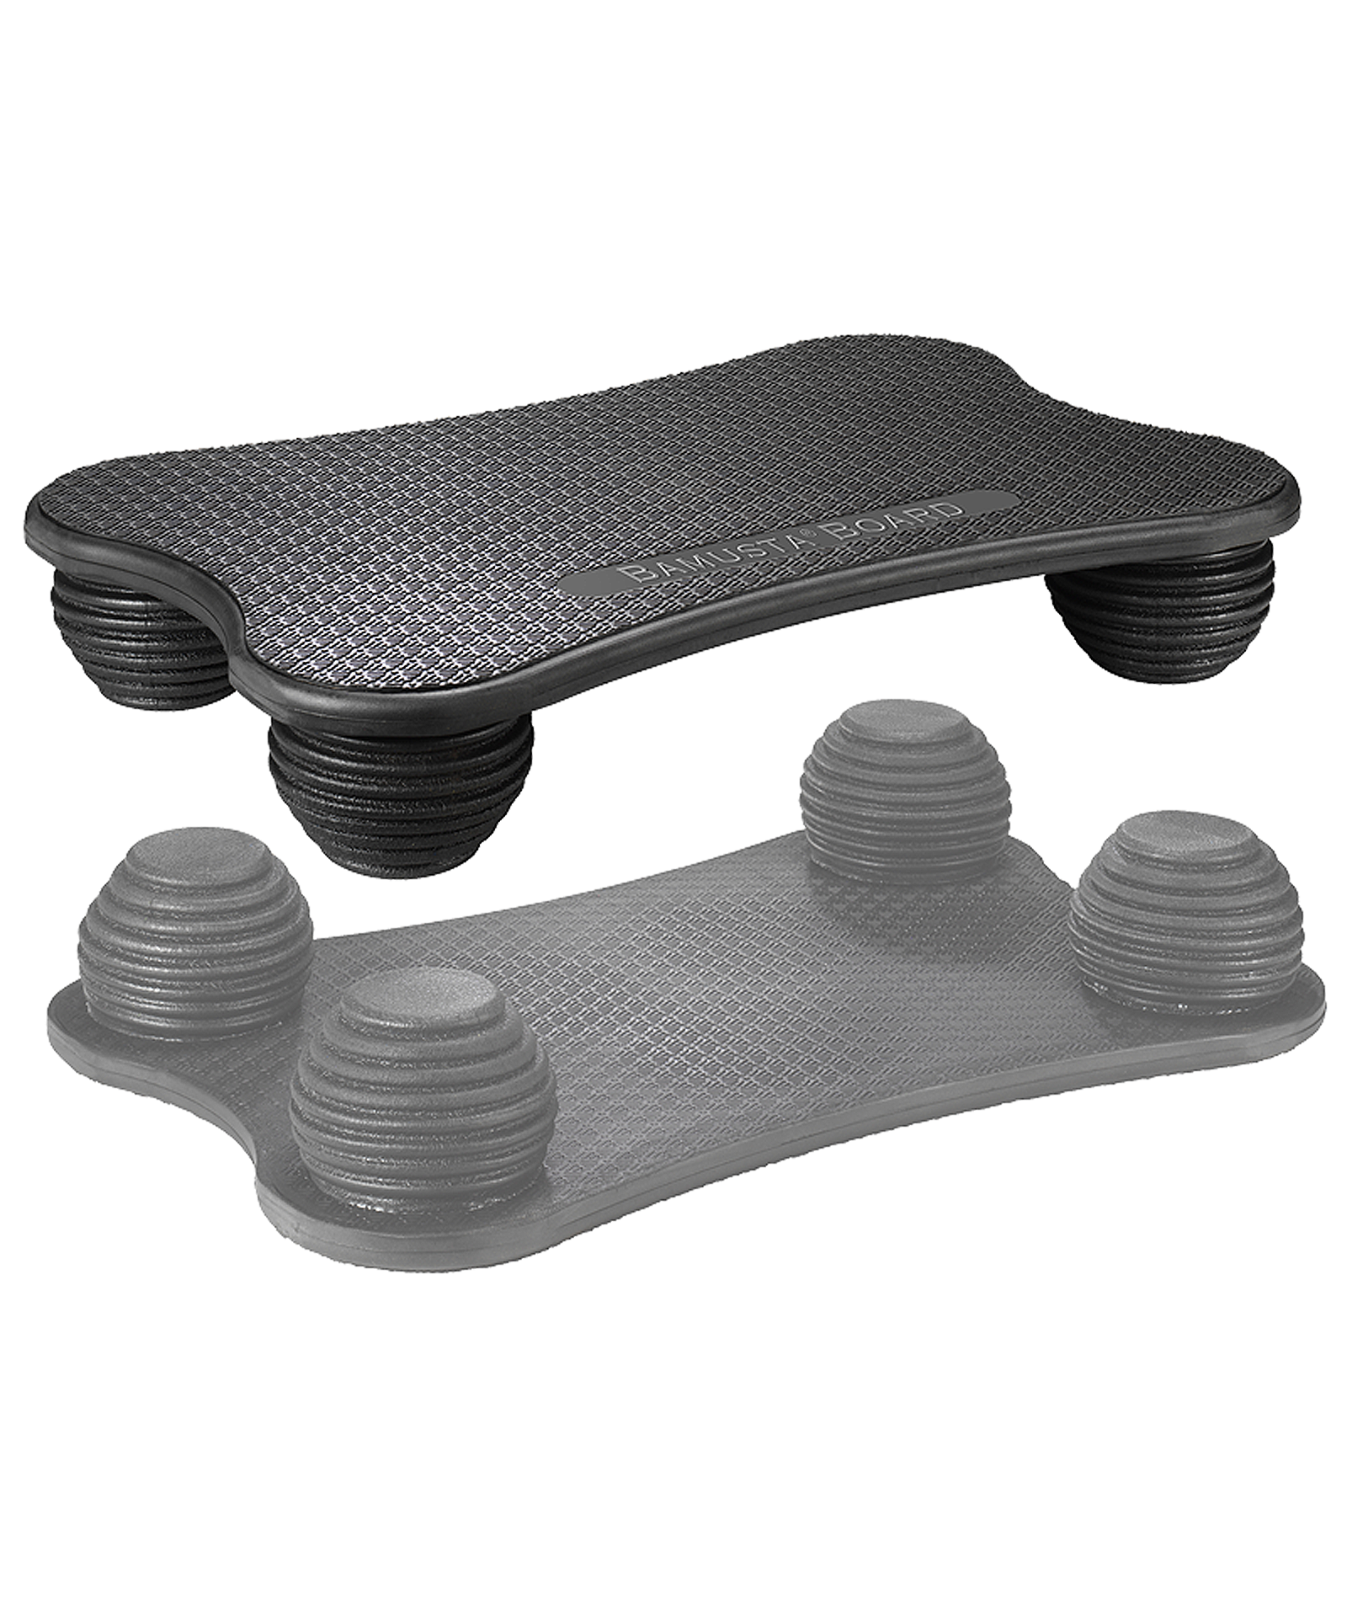 Balance Board - Bamusta Placa (60 x 39 x 10 cm) Fitness Gymnastik Turnen Reha